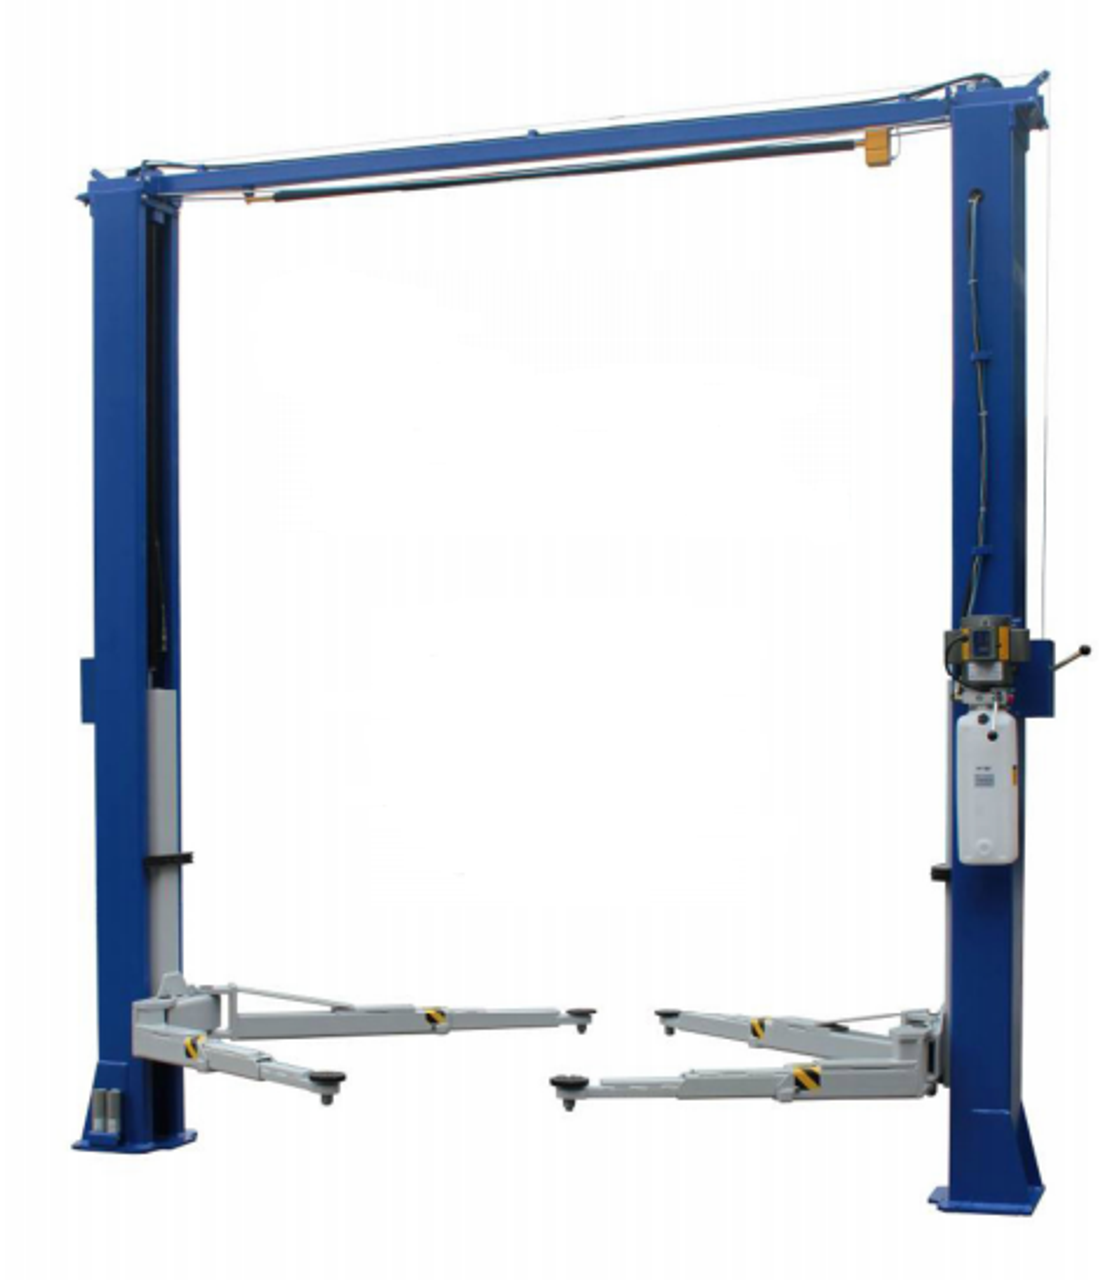 buy a tuxedo tp10kac dx two post lift mile x equipment air suspension diagram tuxedo tp10kac dx 10,000lb capacity two post lift etl ali certified